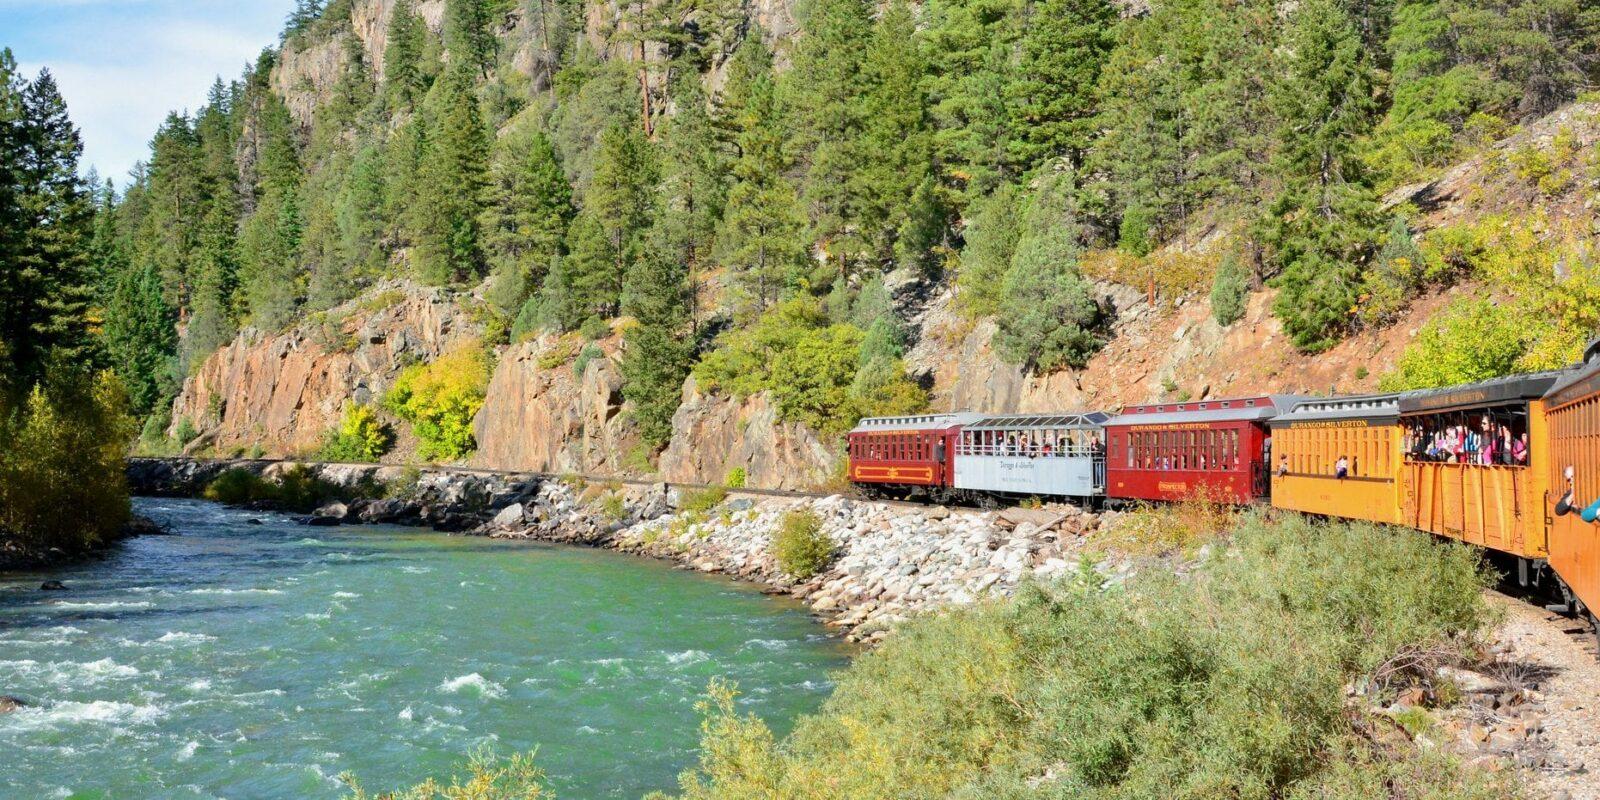 image of durango and silverton train